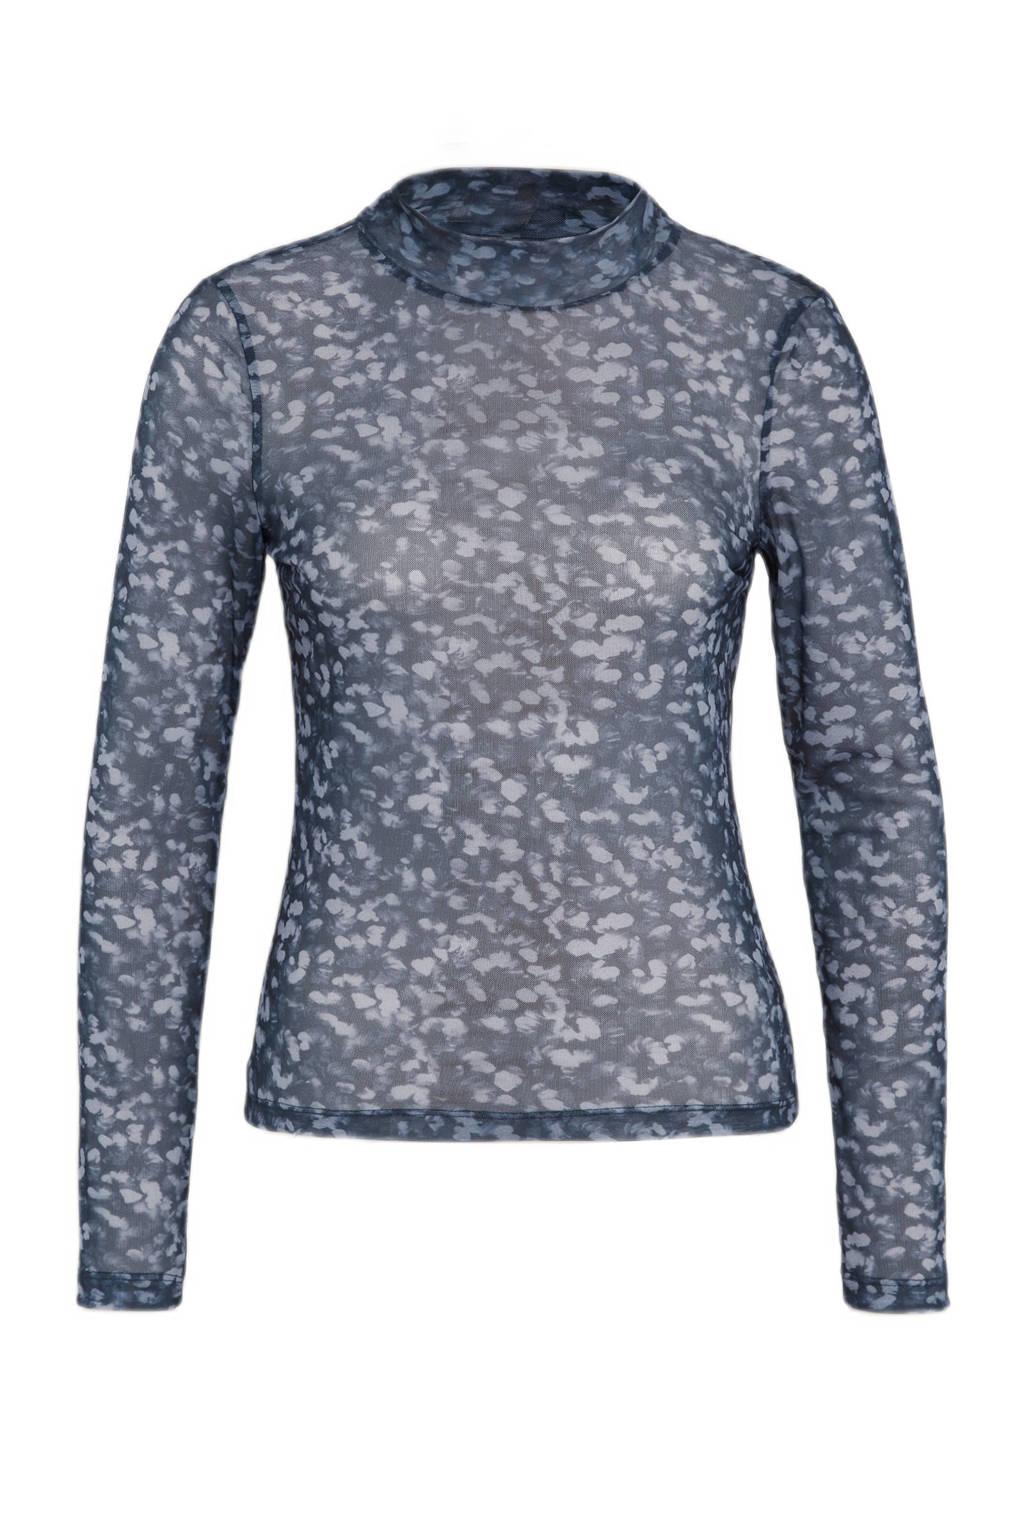 ONLY semi-transparante top ONLASTA met all over print en mesh donkerblauw/wit, Donkerblauw/wit